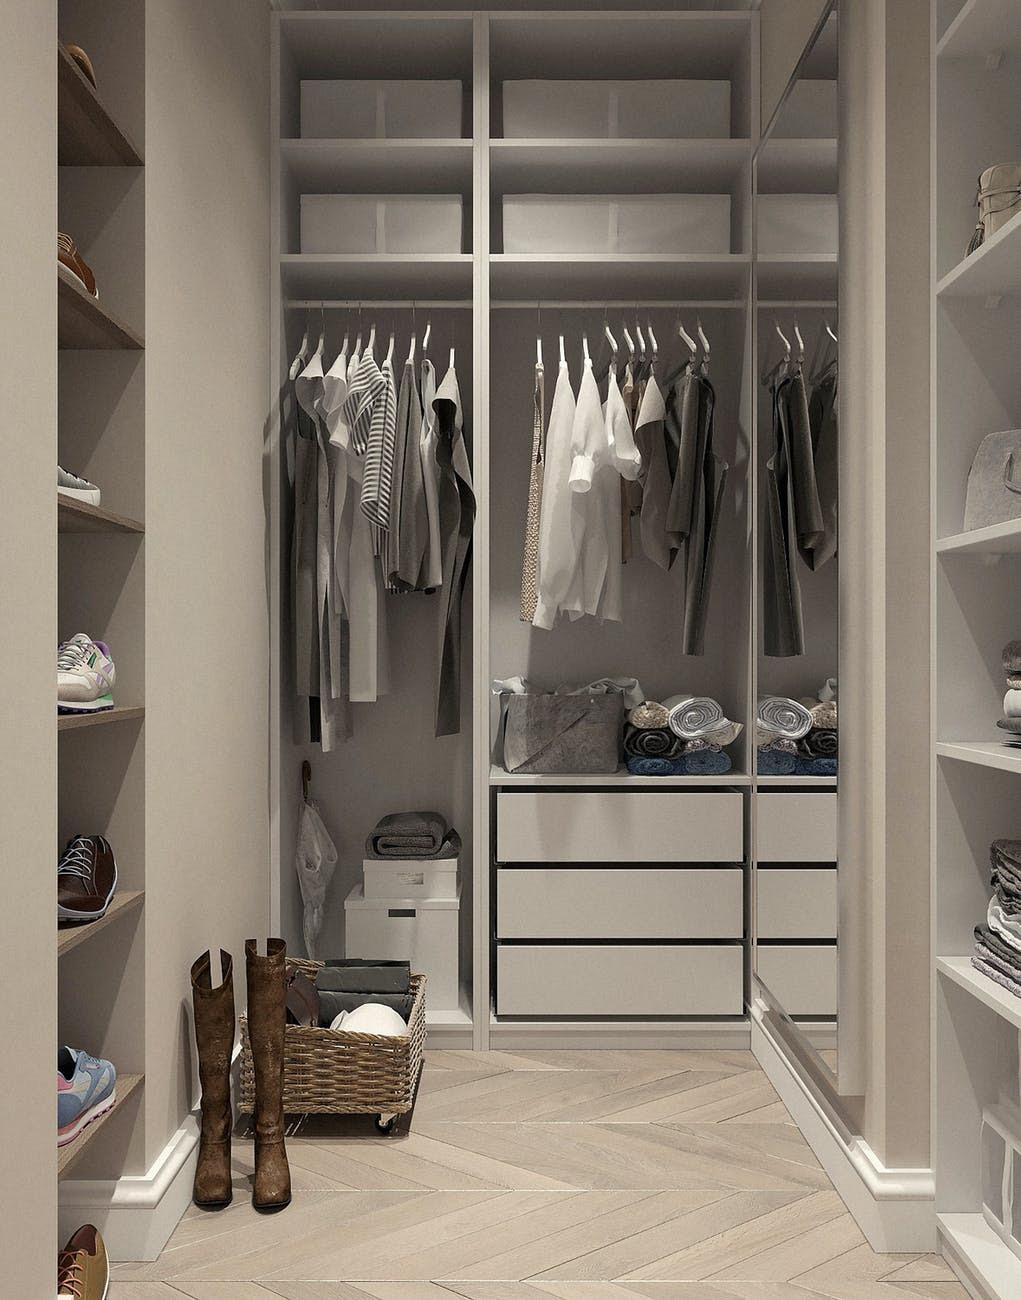 Condo Design Tips for Small Spaces  Home Trends Magazine